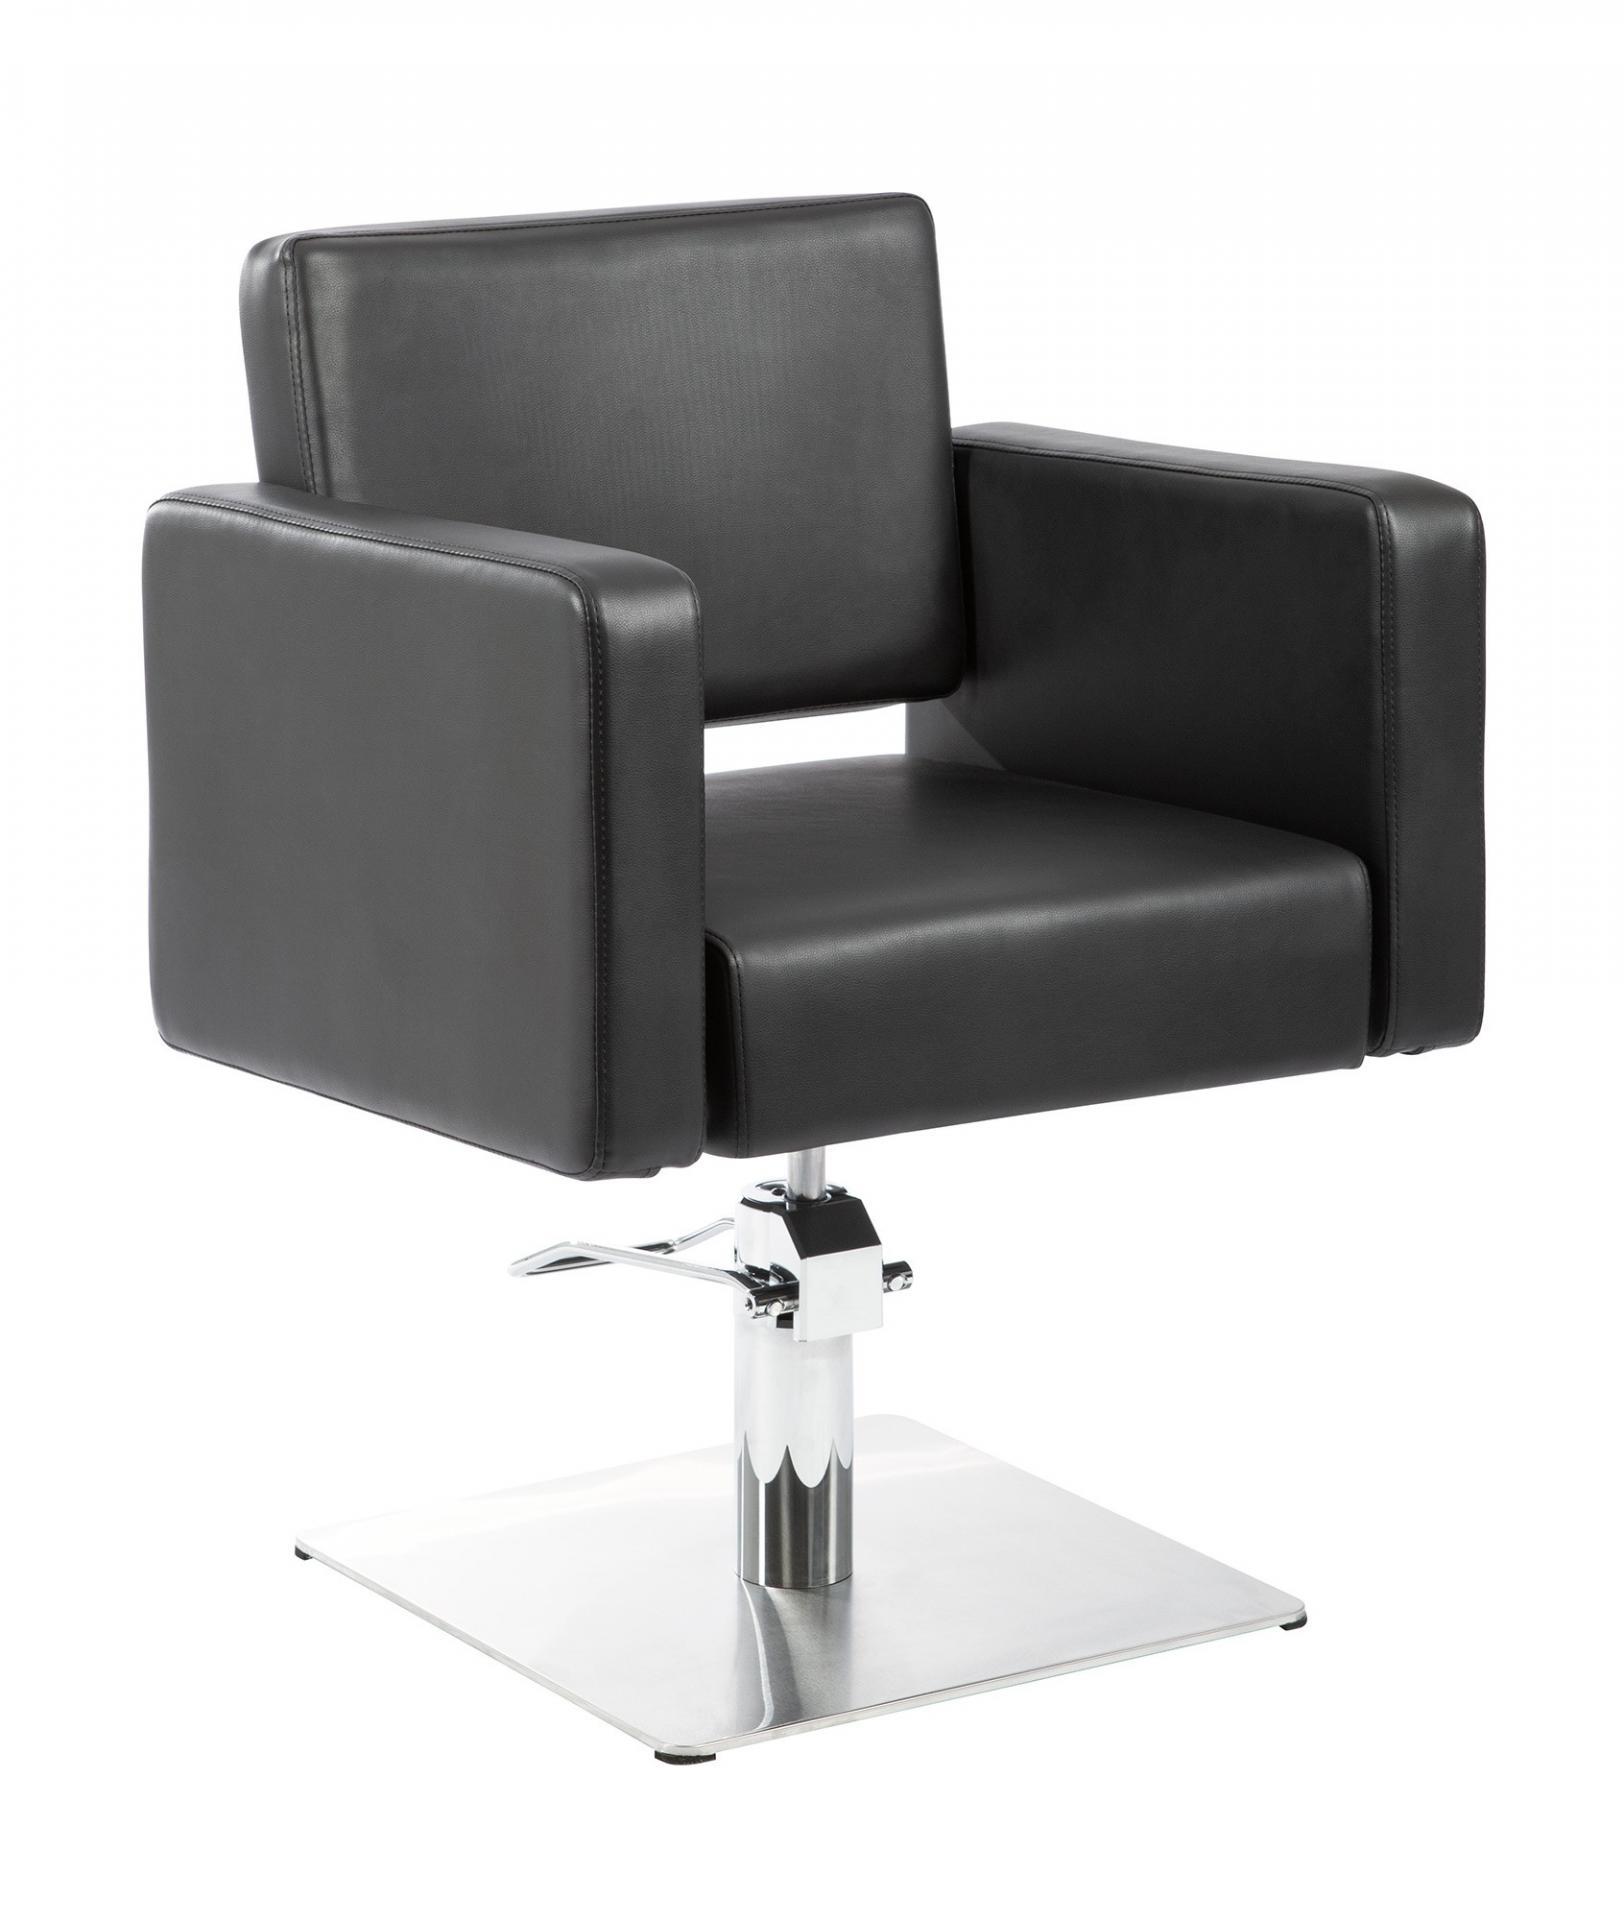 sillón DULERA